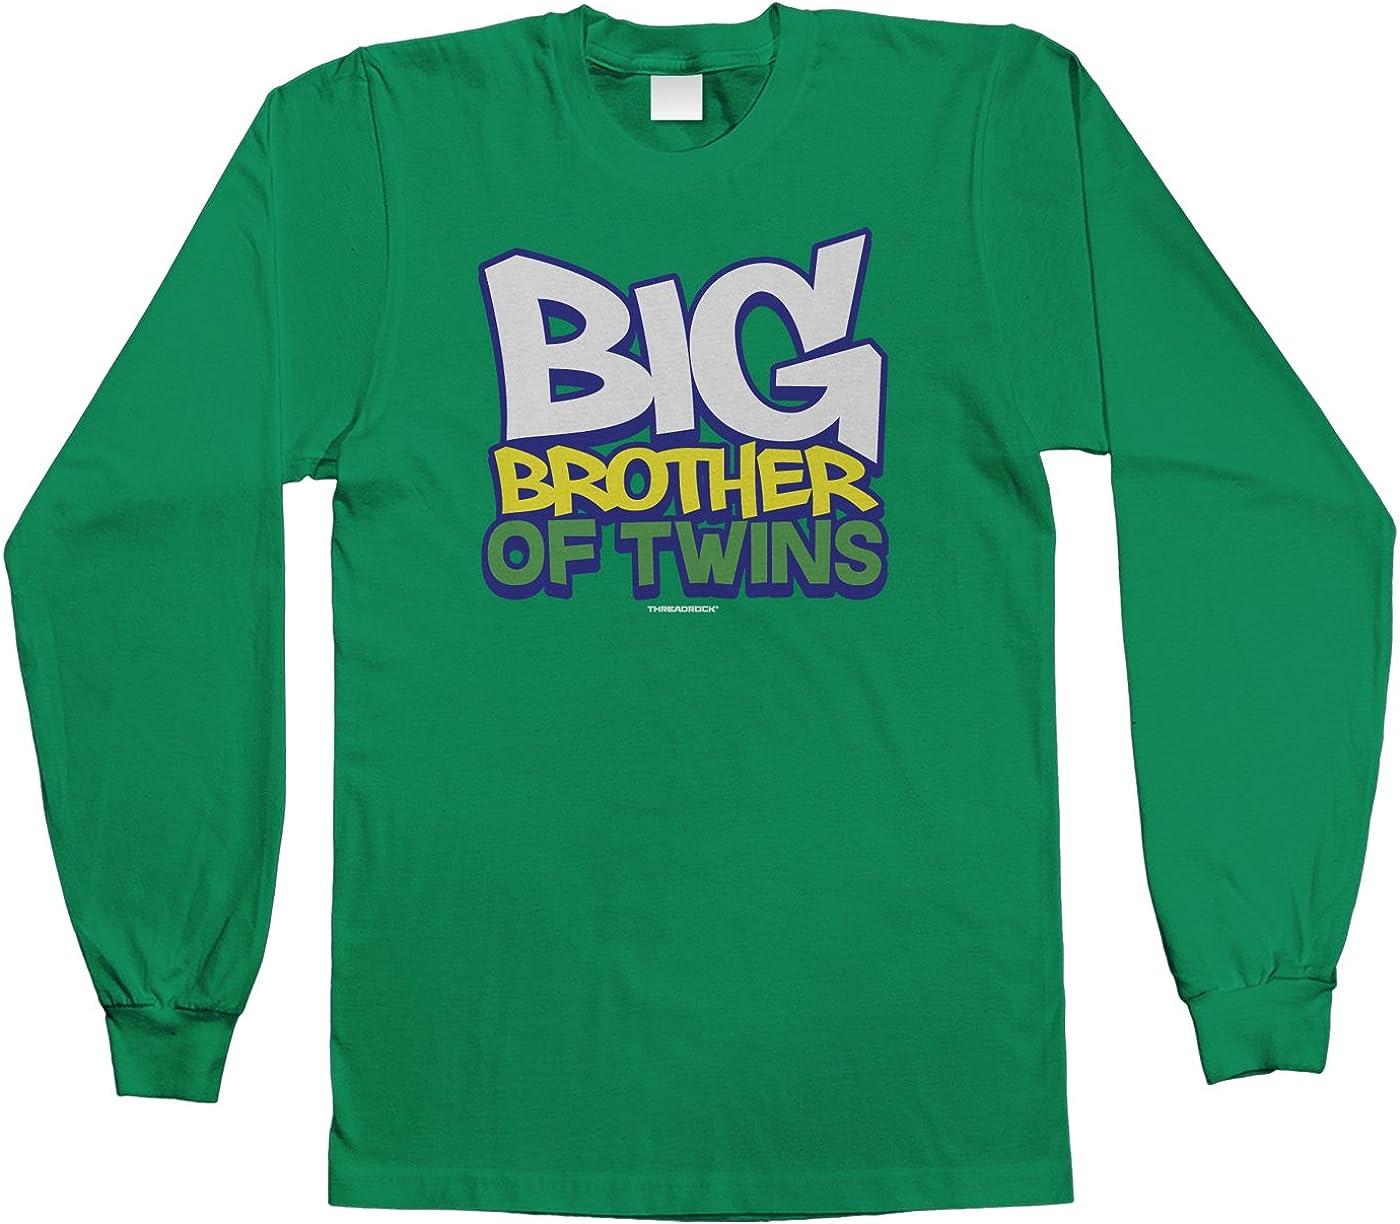 Threadrock Baby Boys Big Brother of Twins Infant T-Shirt